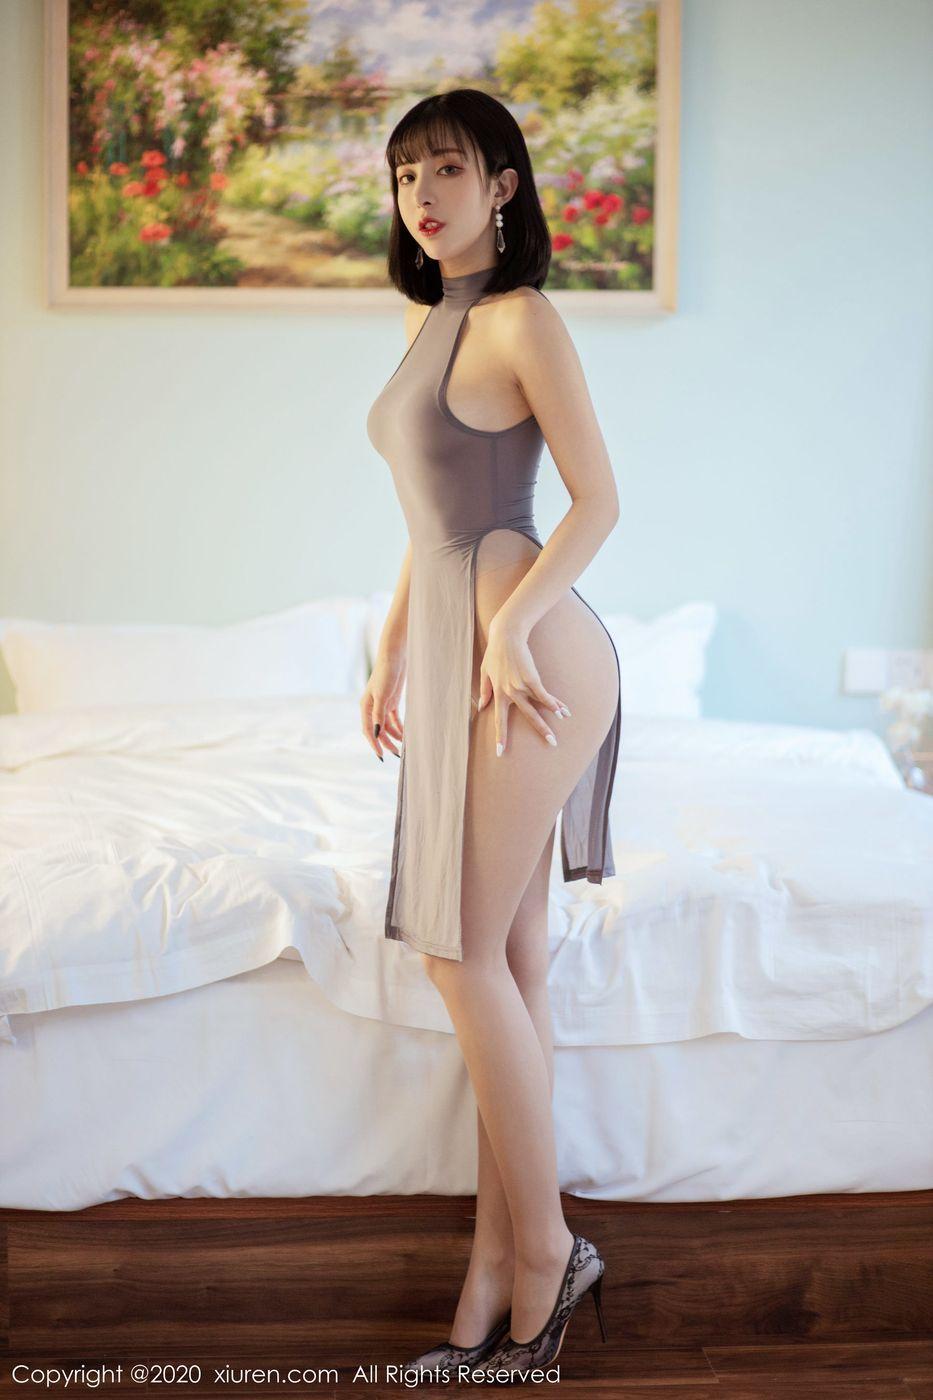 Vol.223 旗袍美女丝袜美腿翘臀腿控福利短发美女美女模特秀人网-陈小喵完整私房照合集